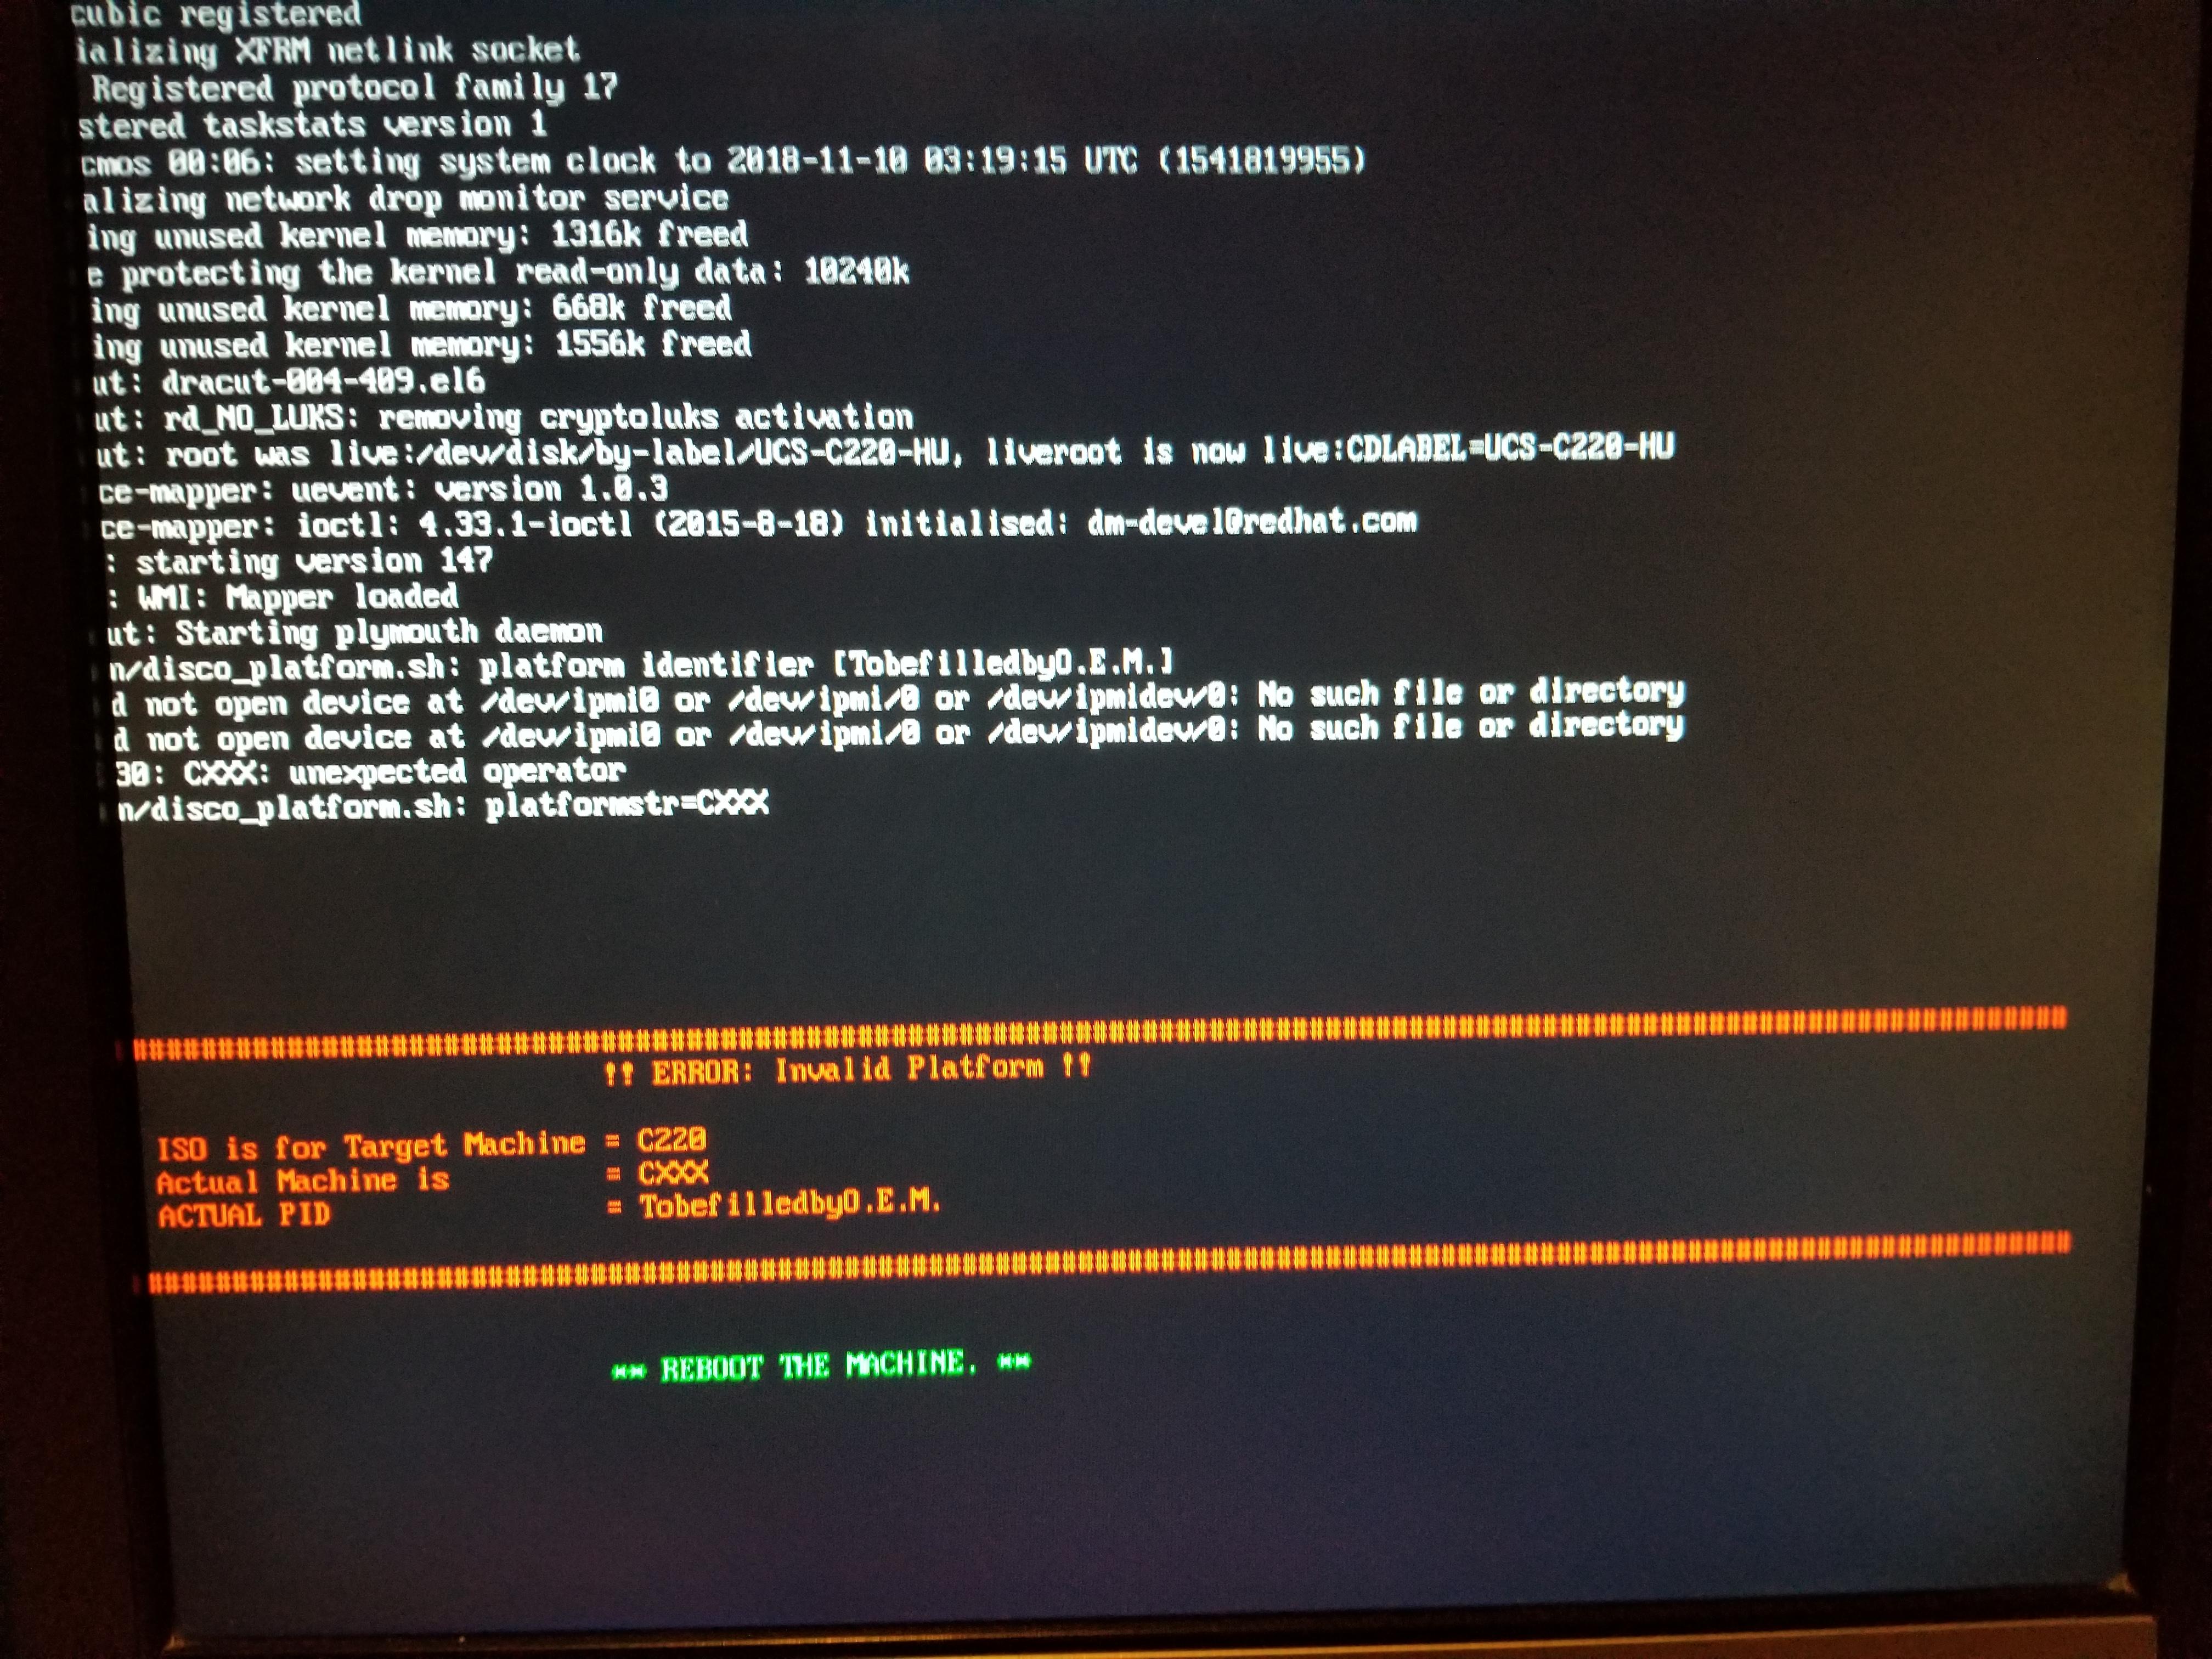 C220 M3 no CIMC, BMC Failed, IPMI error    - Cisco Community